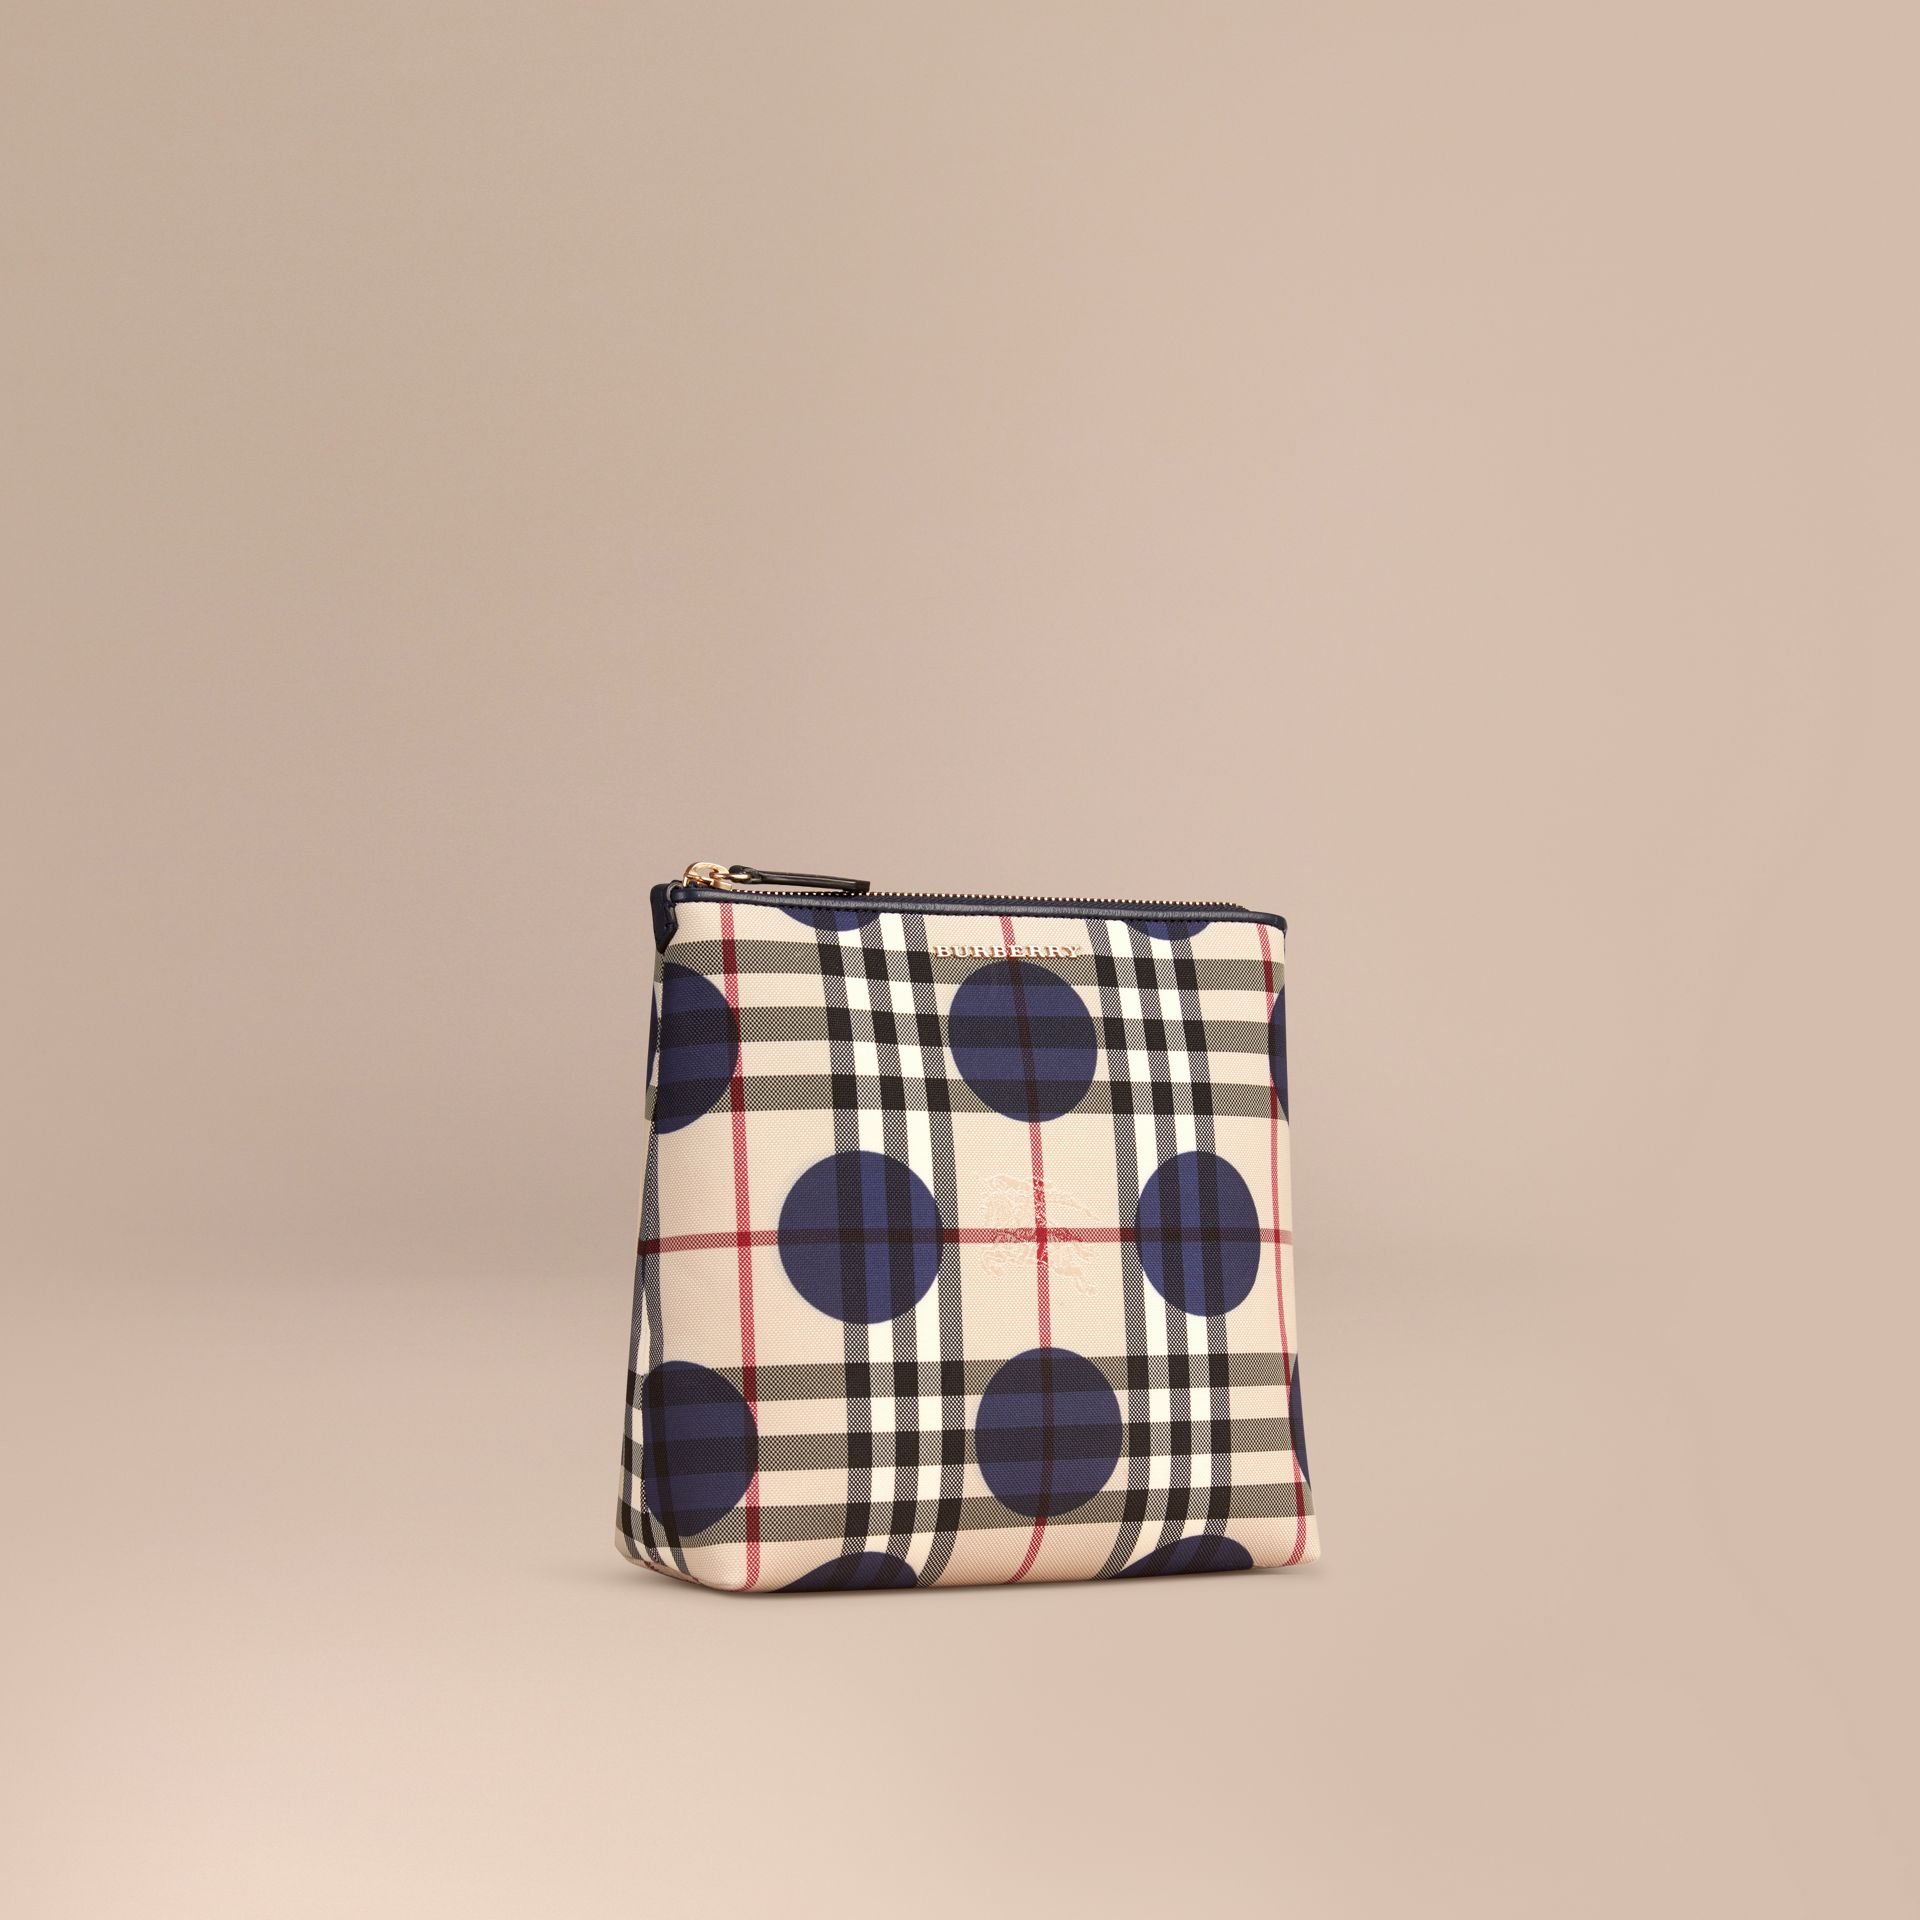 Carbonblau Großer Beutel mit Check- und Punktmuster sowie Lederbesatz Carbonblau - Galerie-Bild 1